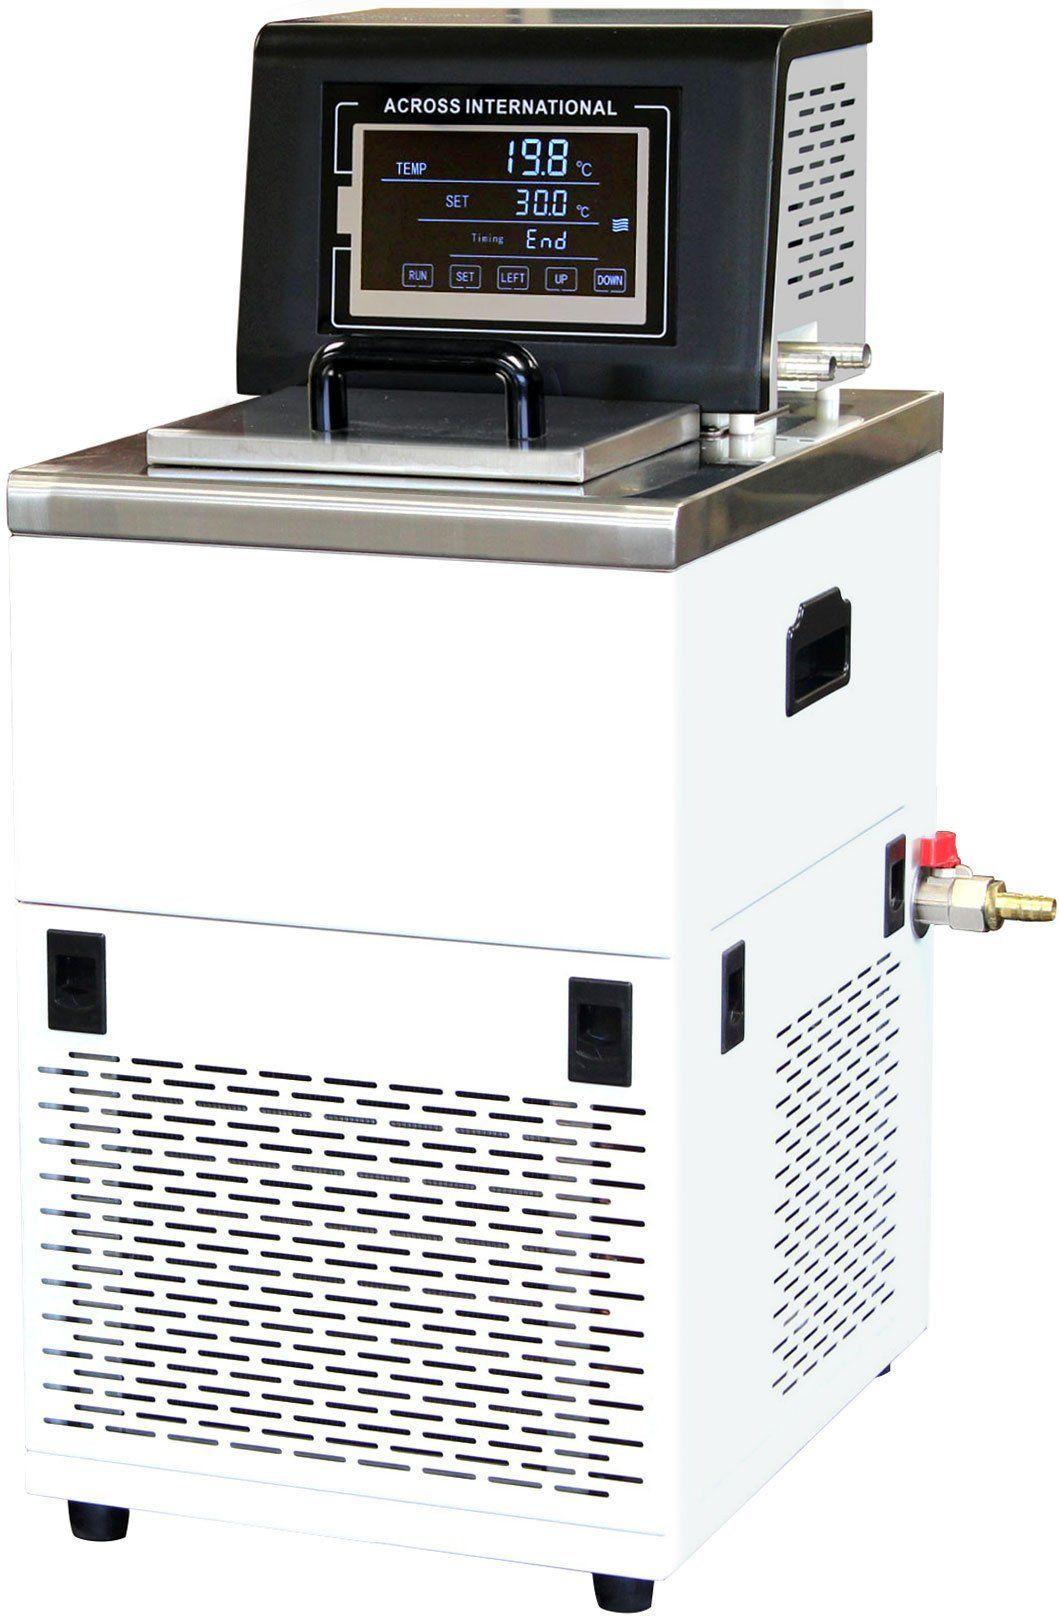 Across International 20c To 99c 7l Capacity Compact Recirculating